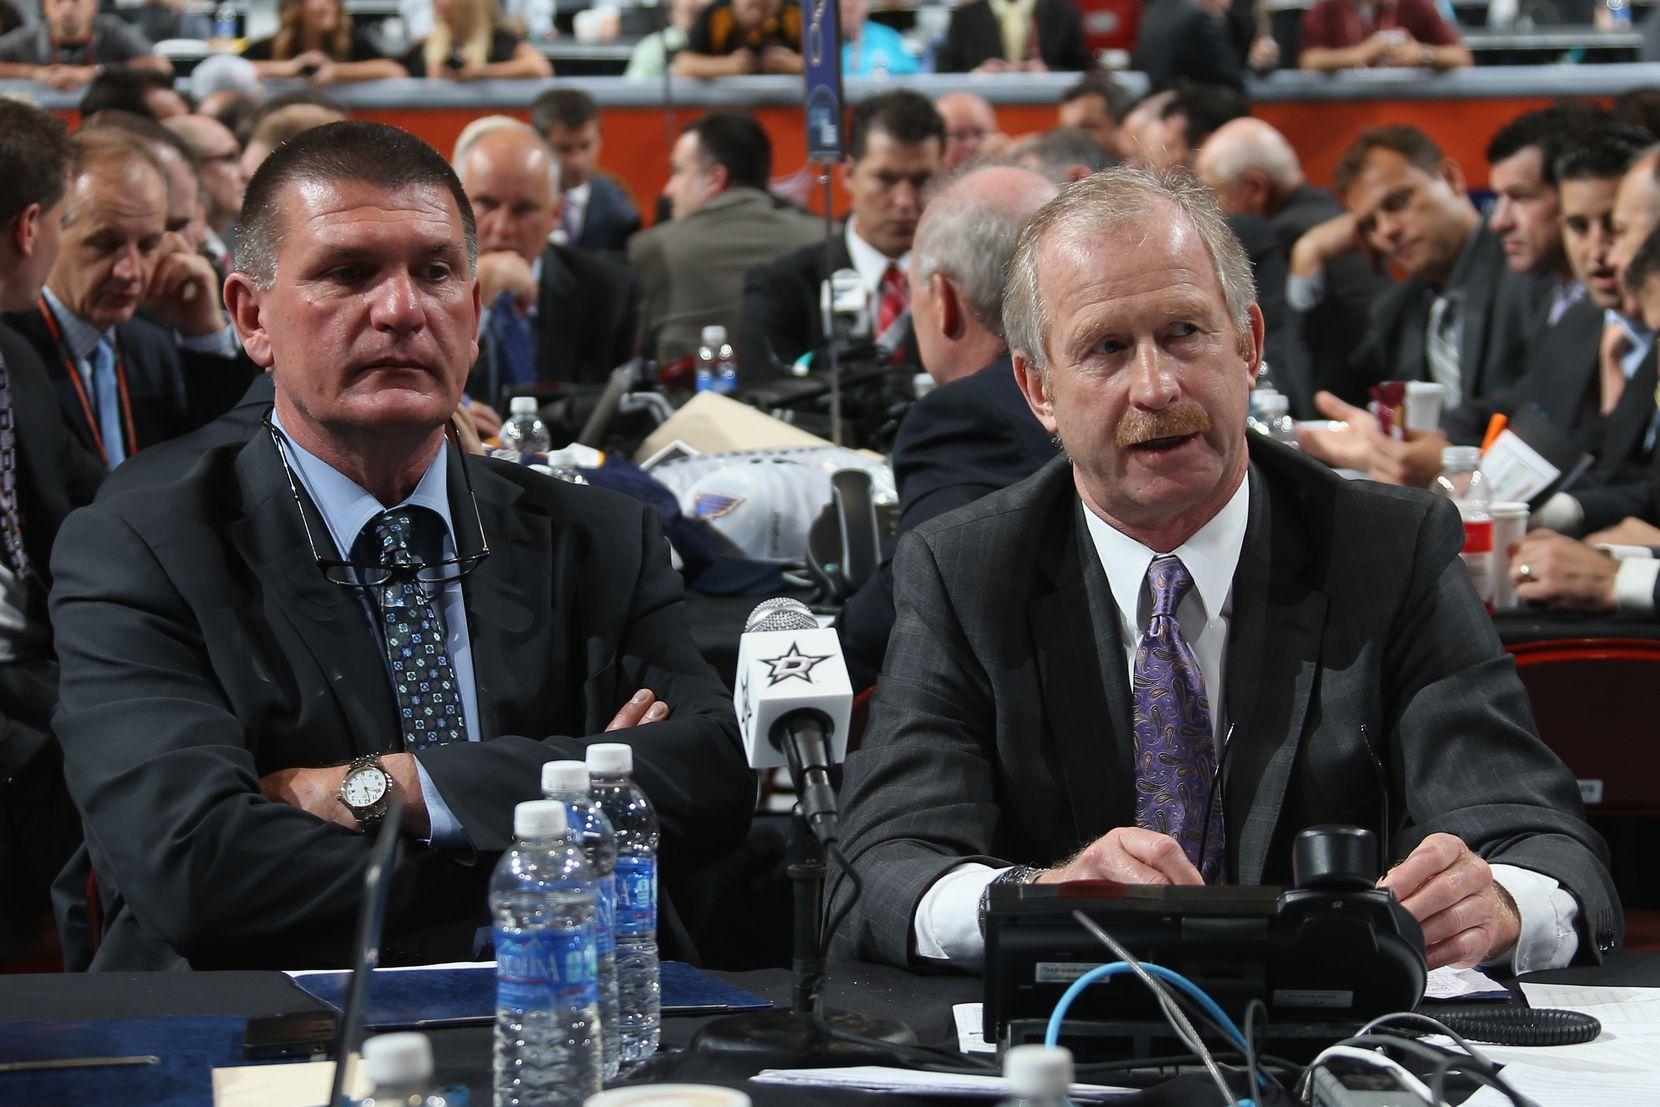 PHILADELPHIA, PA - JUNE 28: Stars scout Joe McDonnell sits alongside GM Jim Nill on Day 2 of the 2014 NHL draft at the Wells Fargo Center on June 28, 2014, in Philadelphia. (Photo by Bruce Bennett/Getty Images)